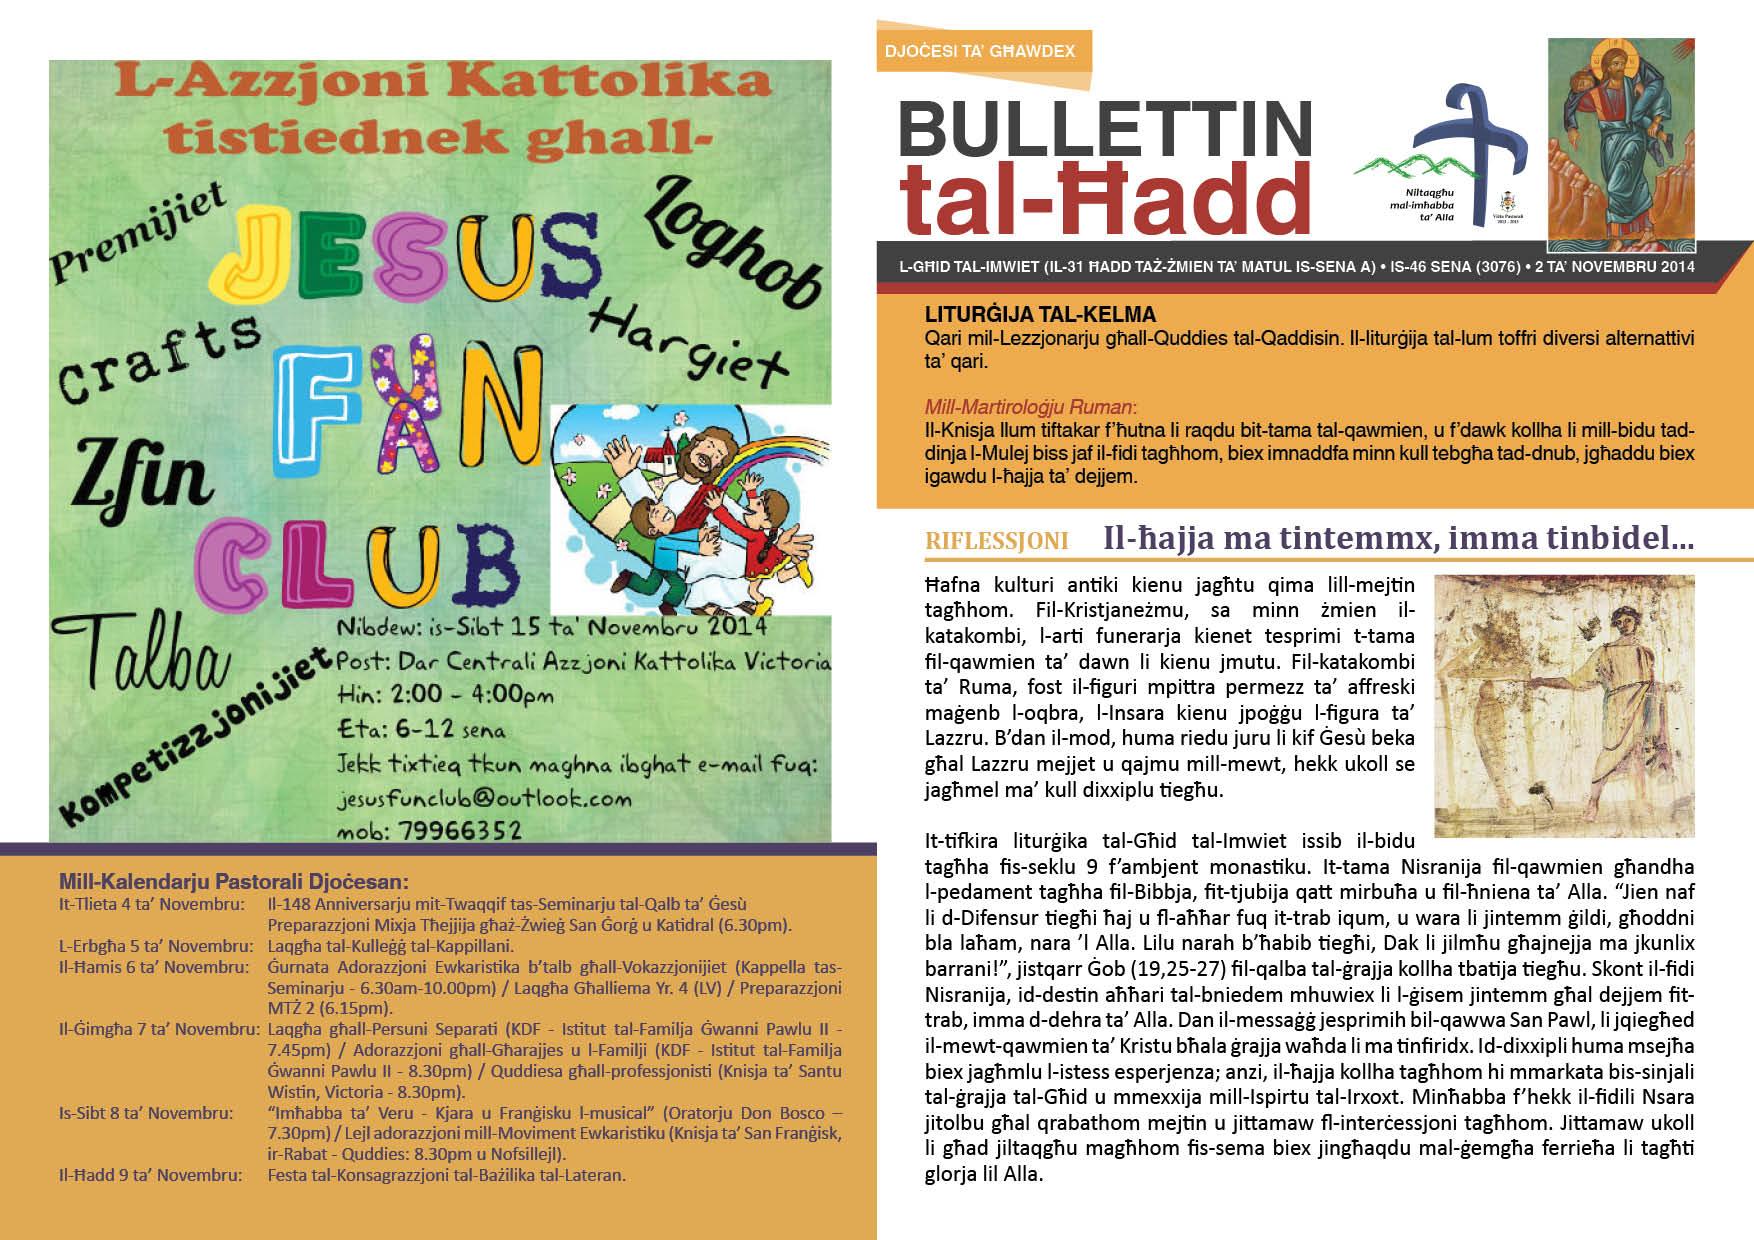 bullettin-2014-novembru-02.jpg